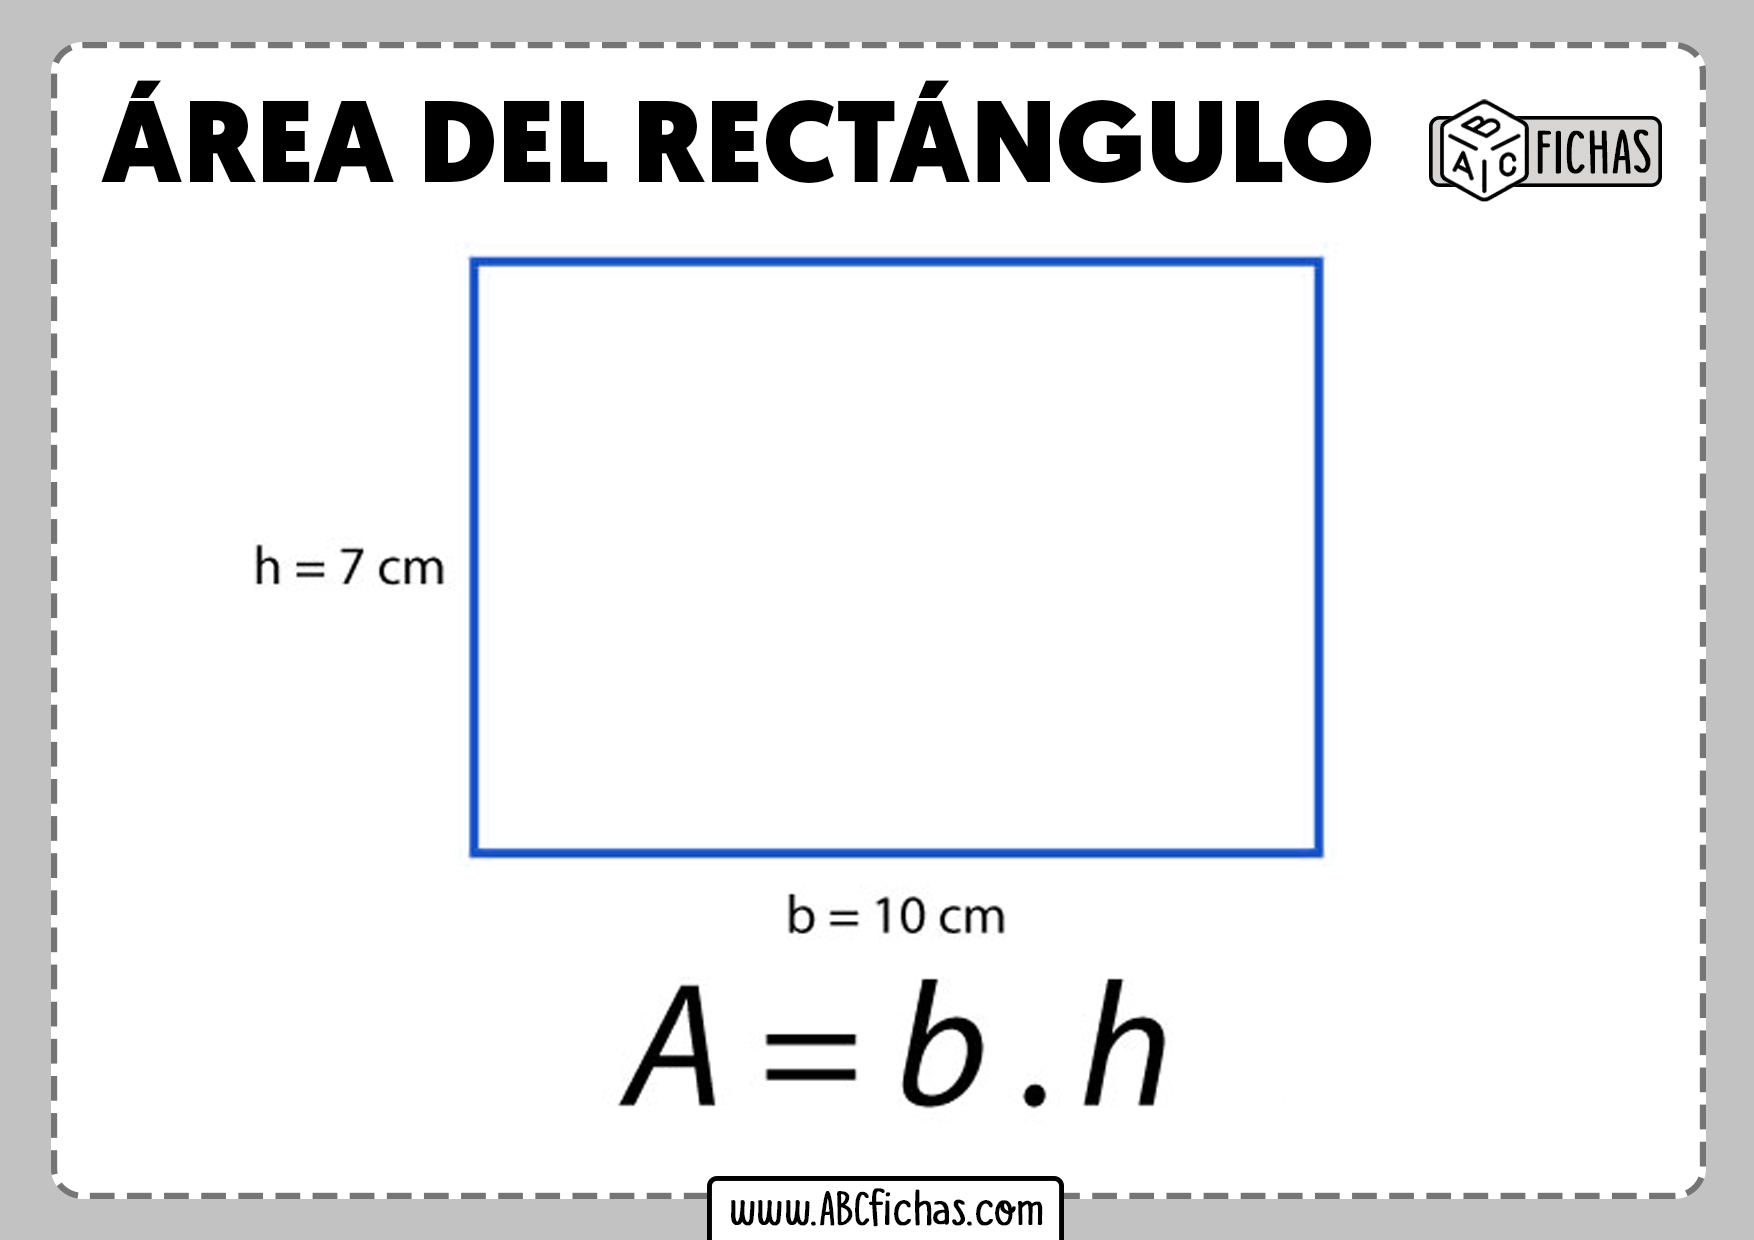 Formula area del rectangulo